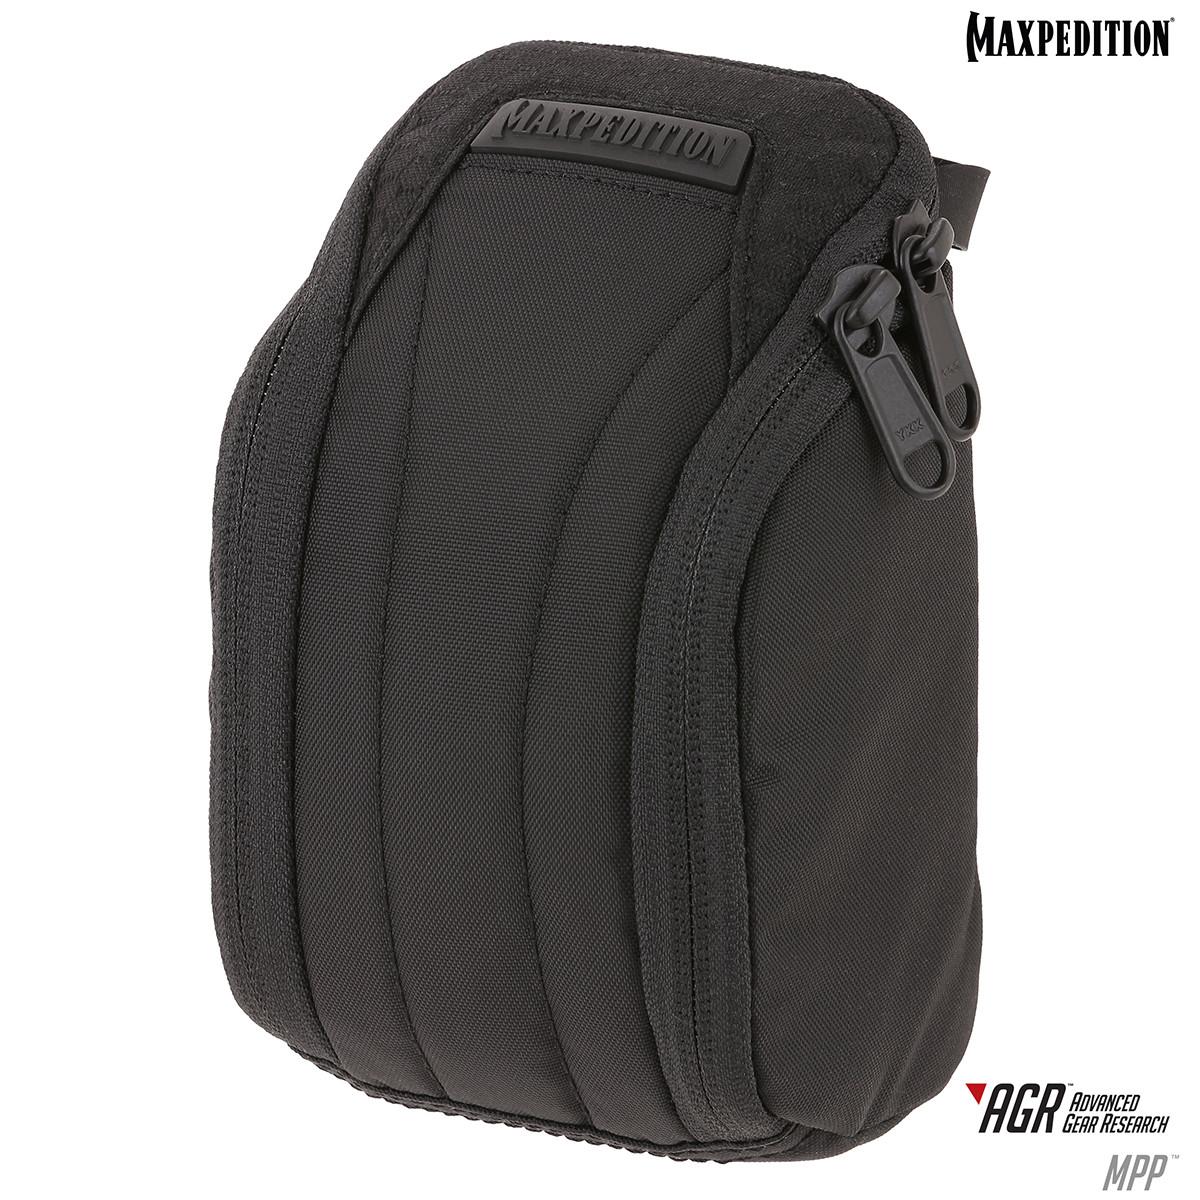 Maxpedition MPP™ Medium Padded Pouch